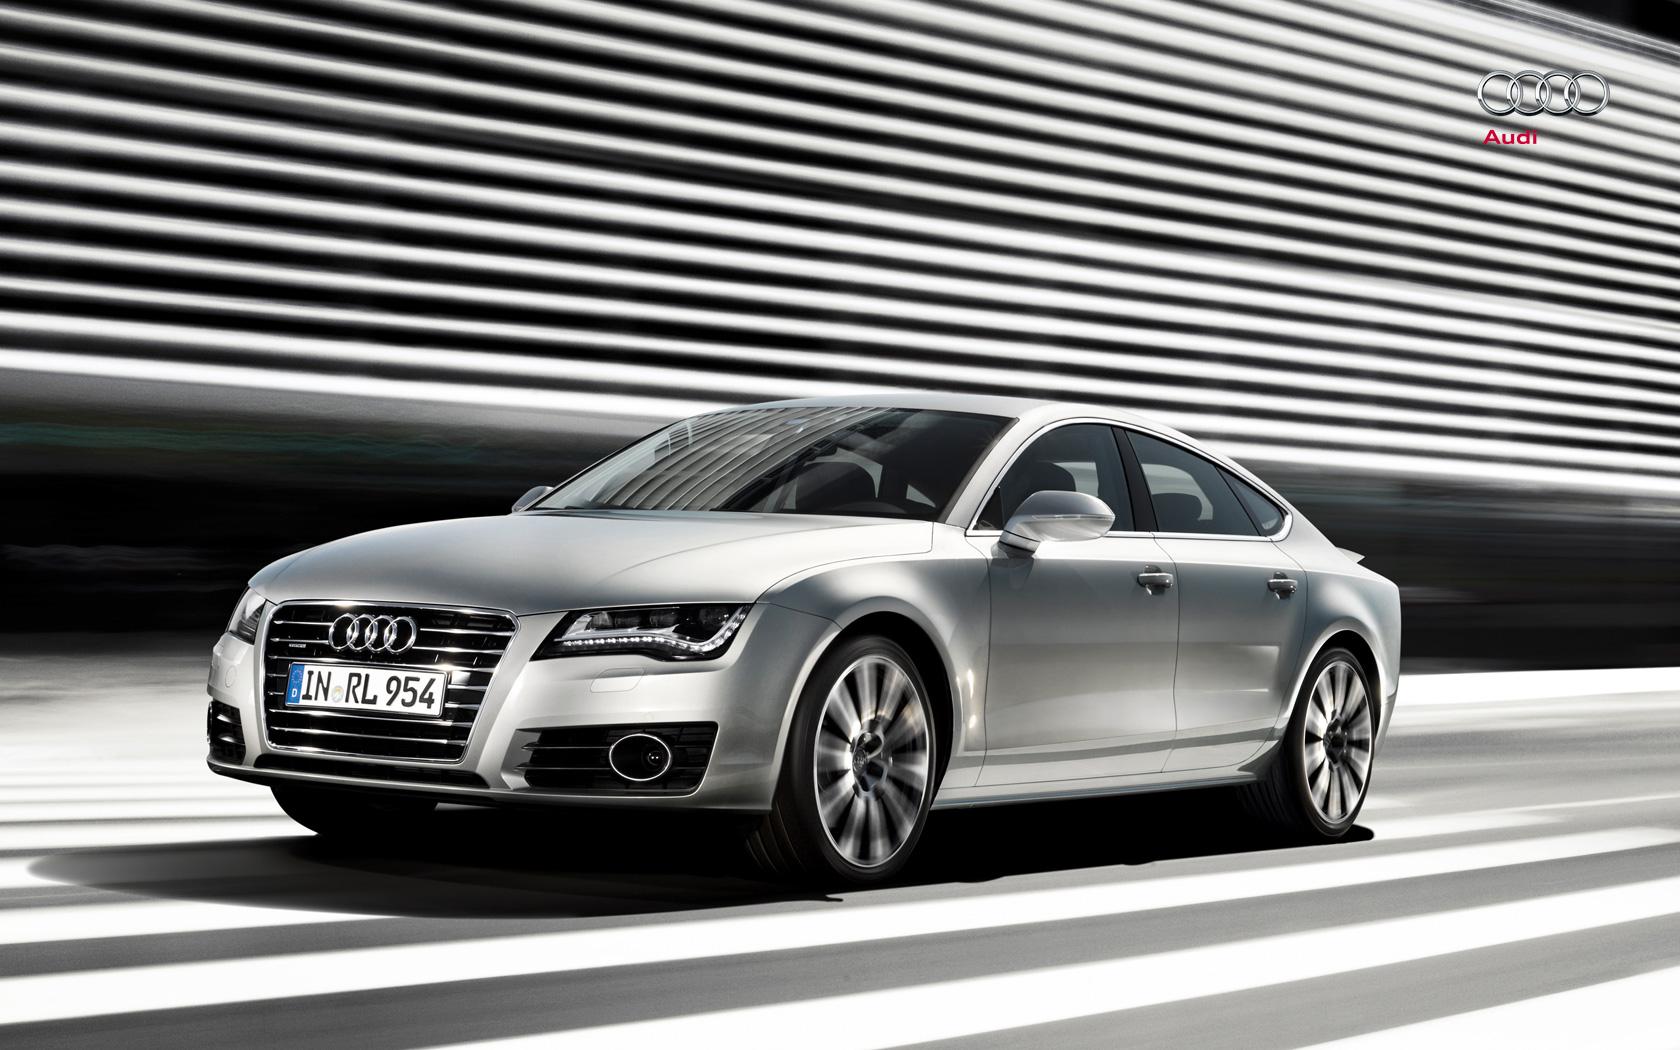 audi wallpaper (Audi A7)